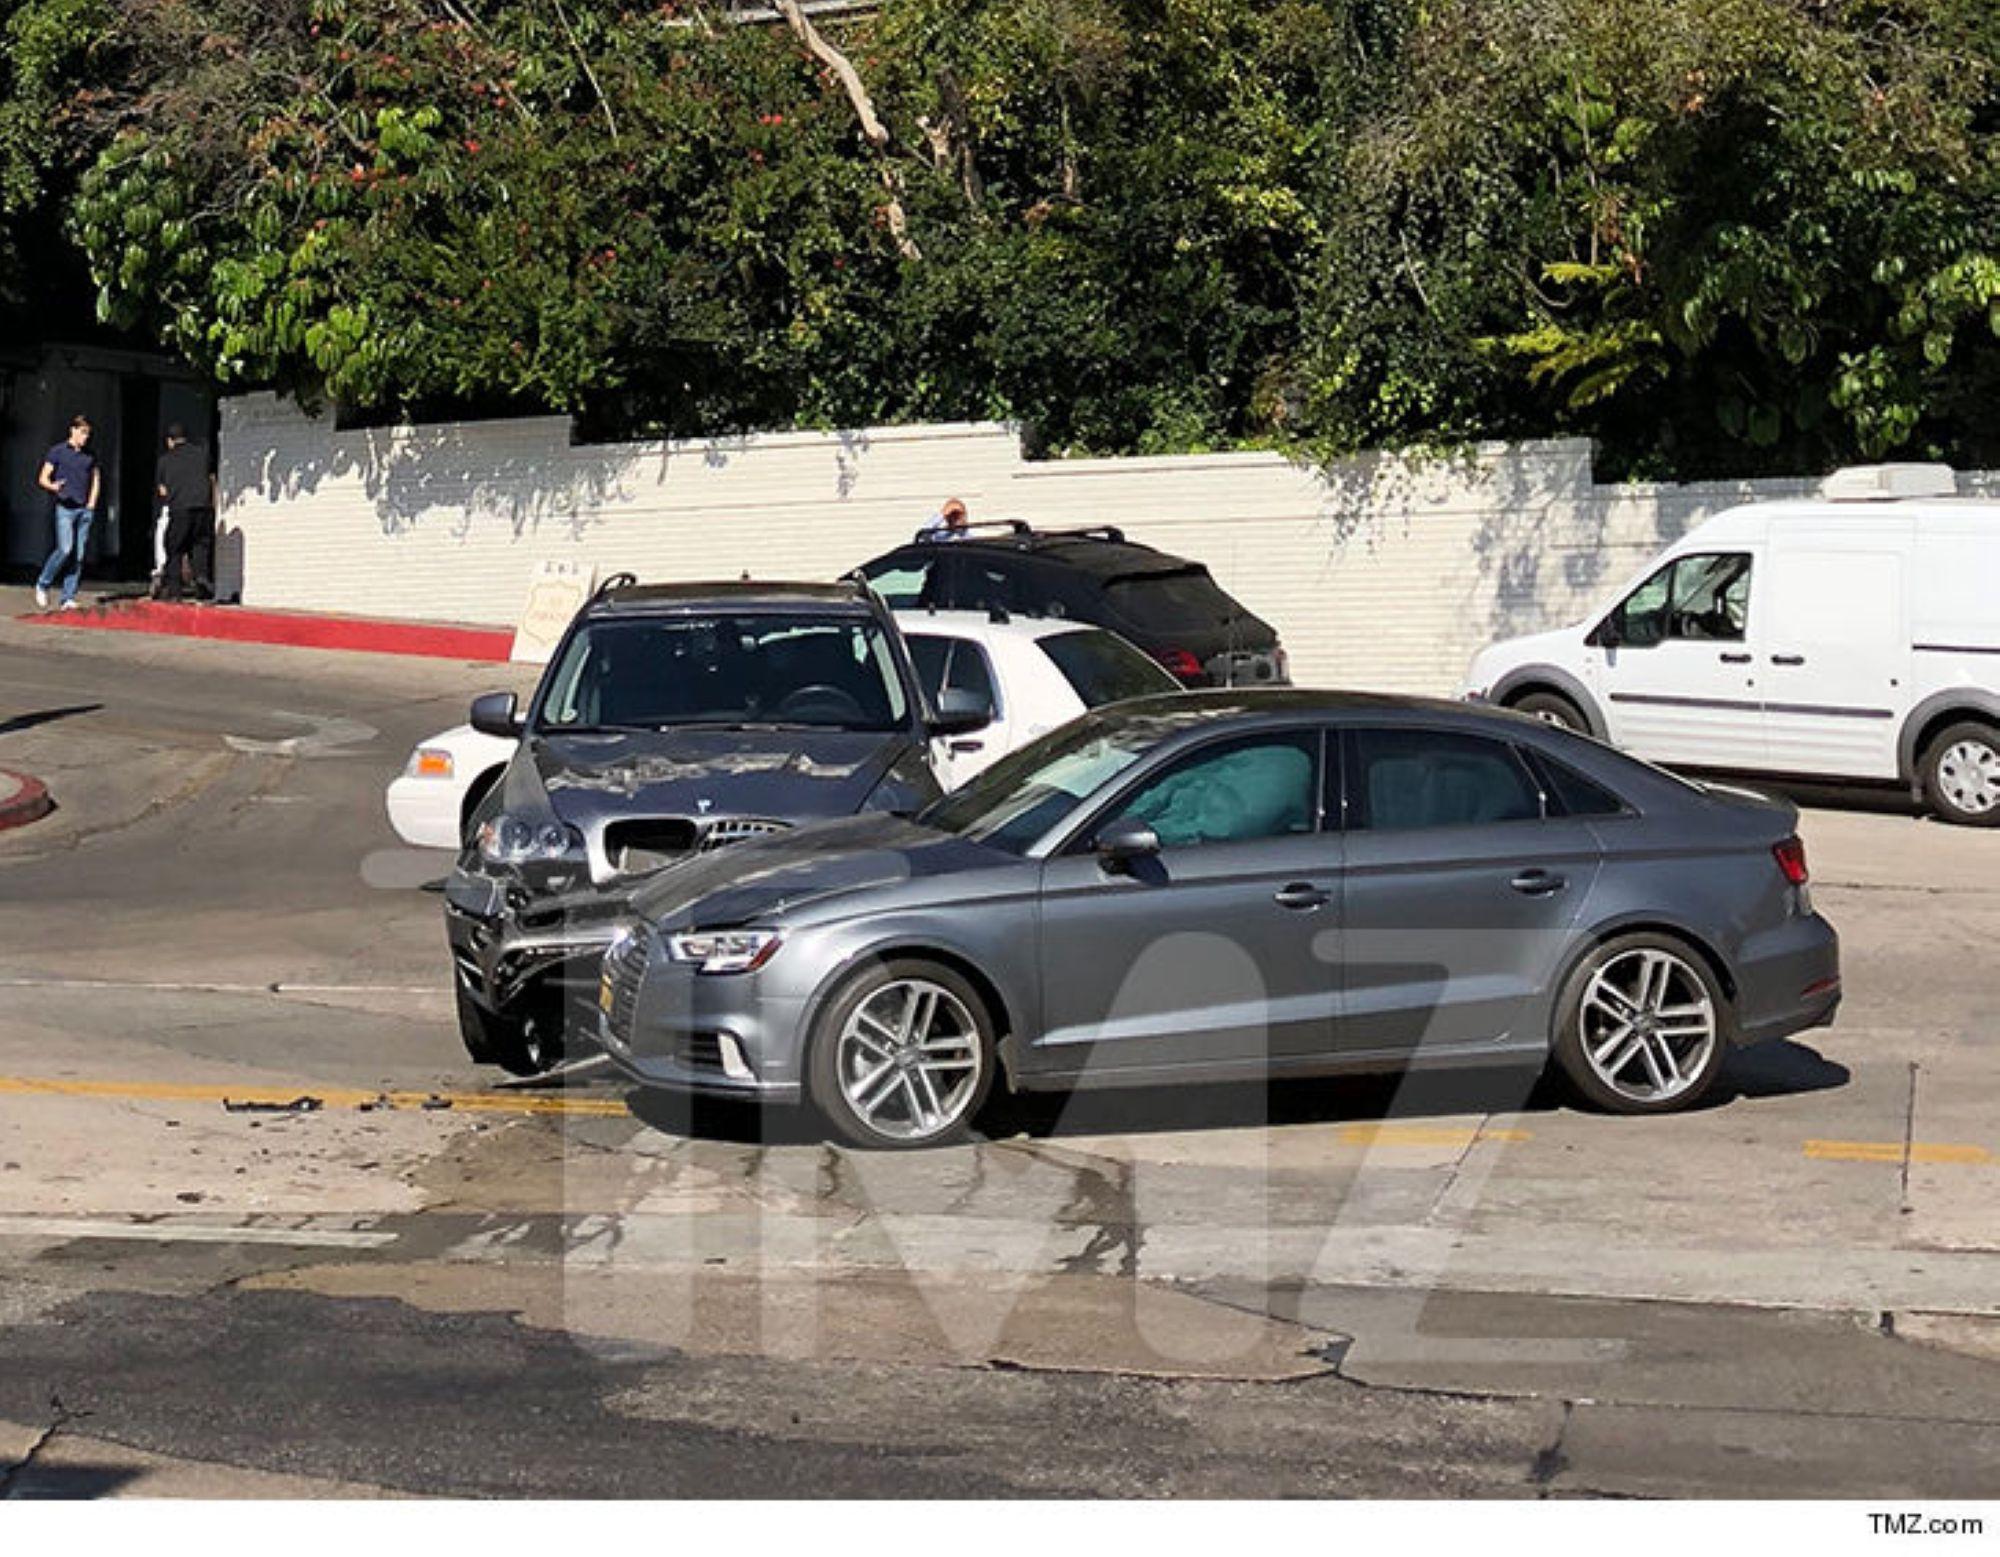 02-Kimmel-Car-Accident_1